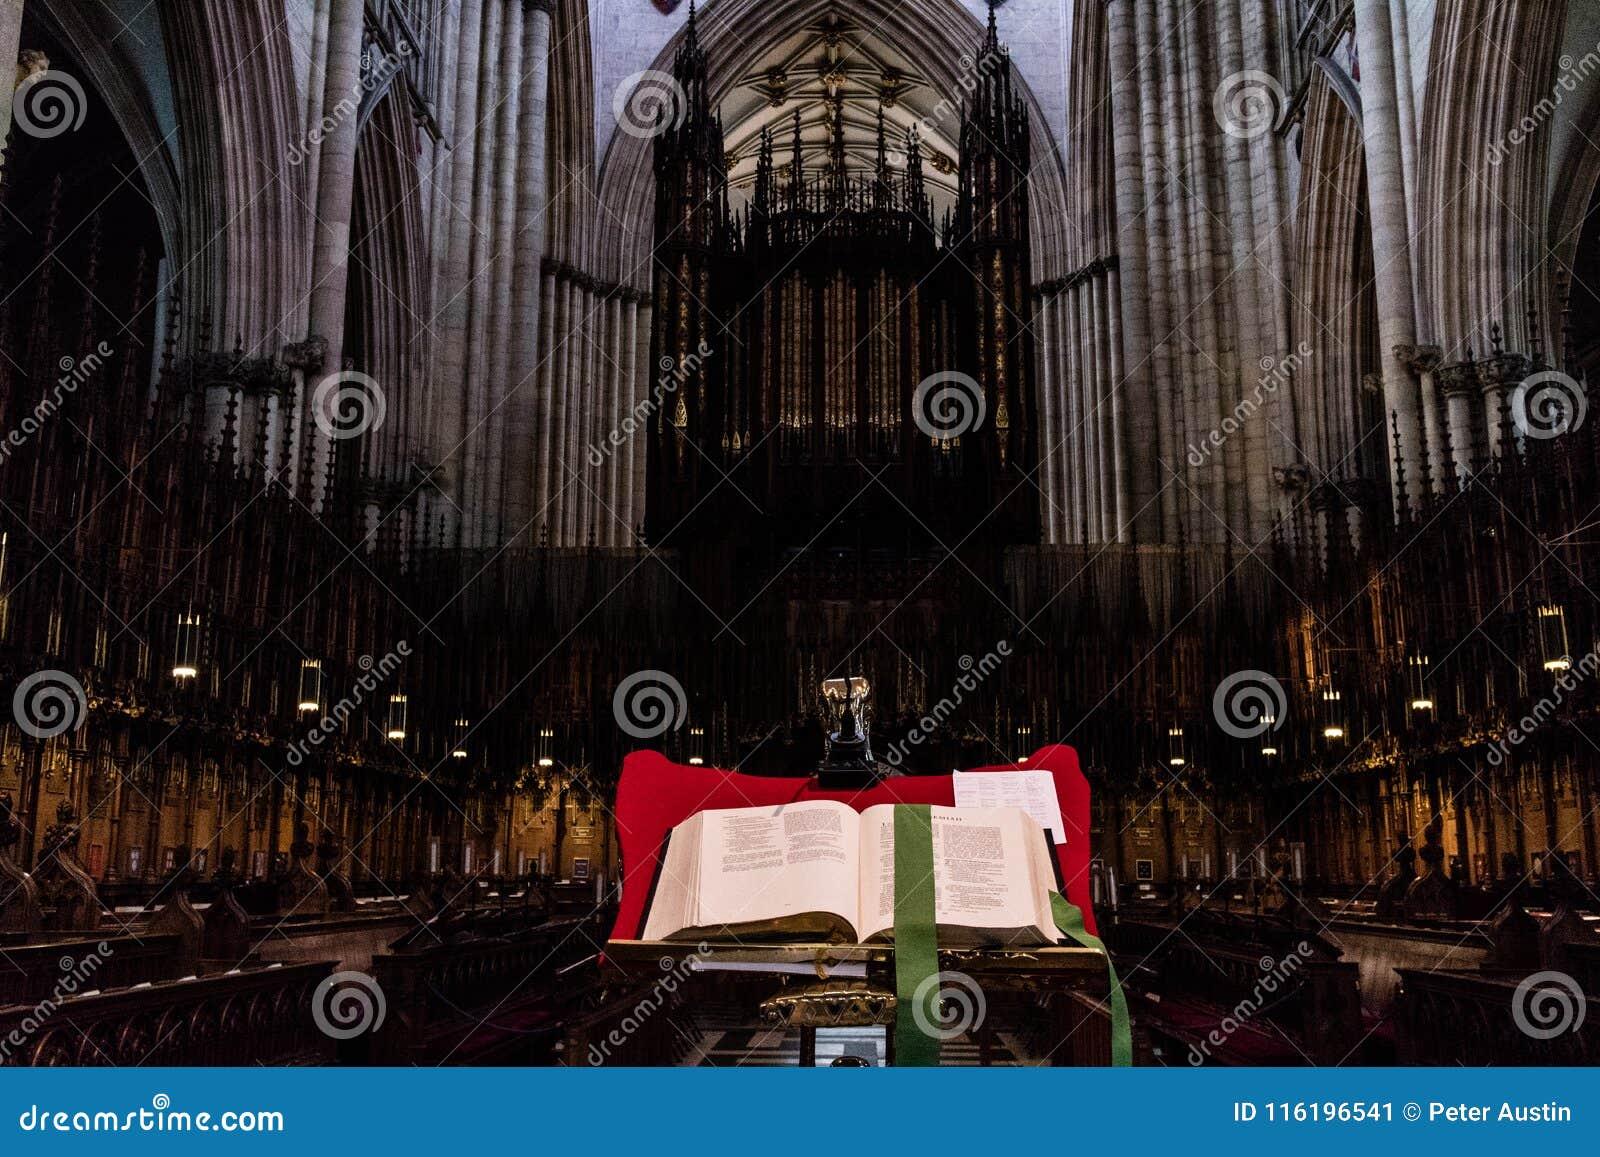 York, Reino Unido - 02/08/2018: Iglesia de monasterio interior de York